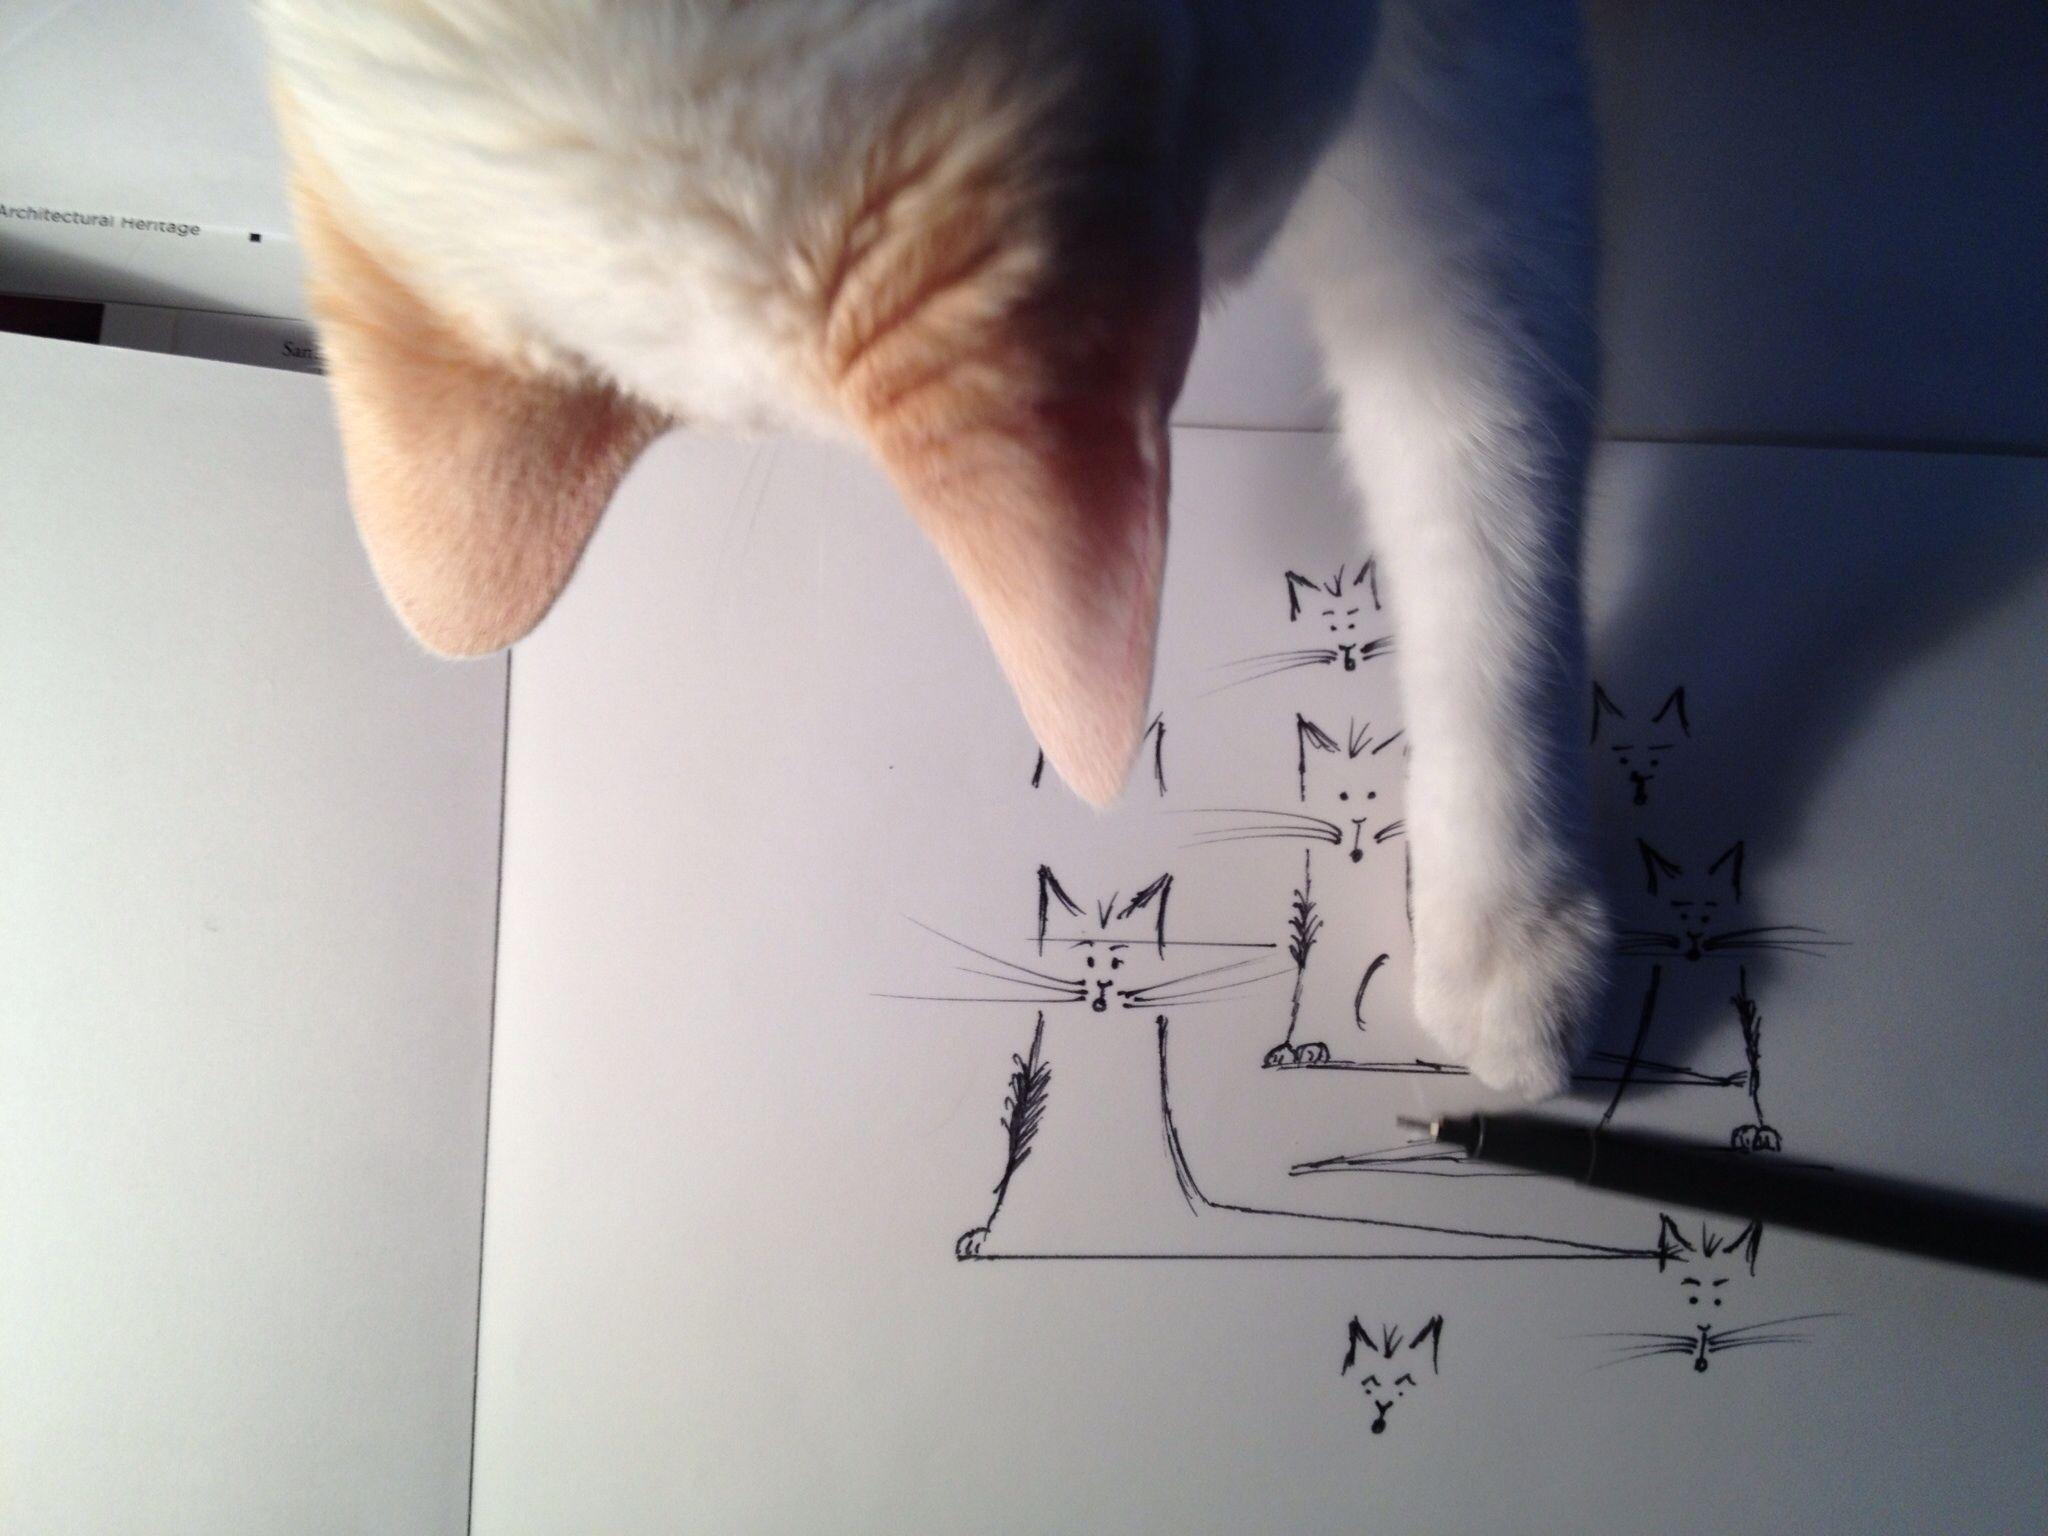 #clickittycat